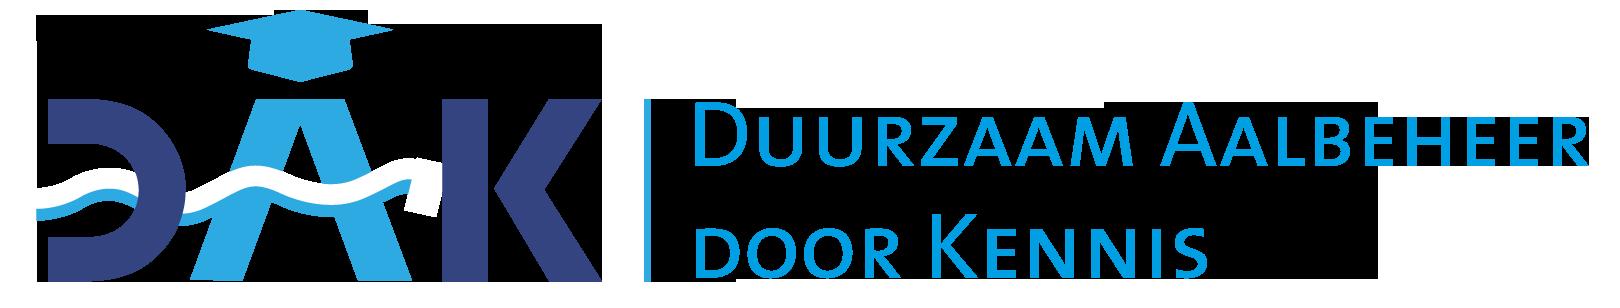 Dakproject Logo